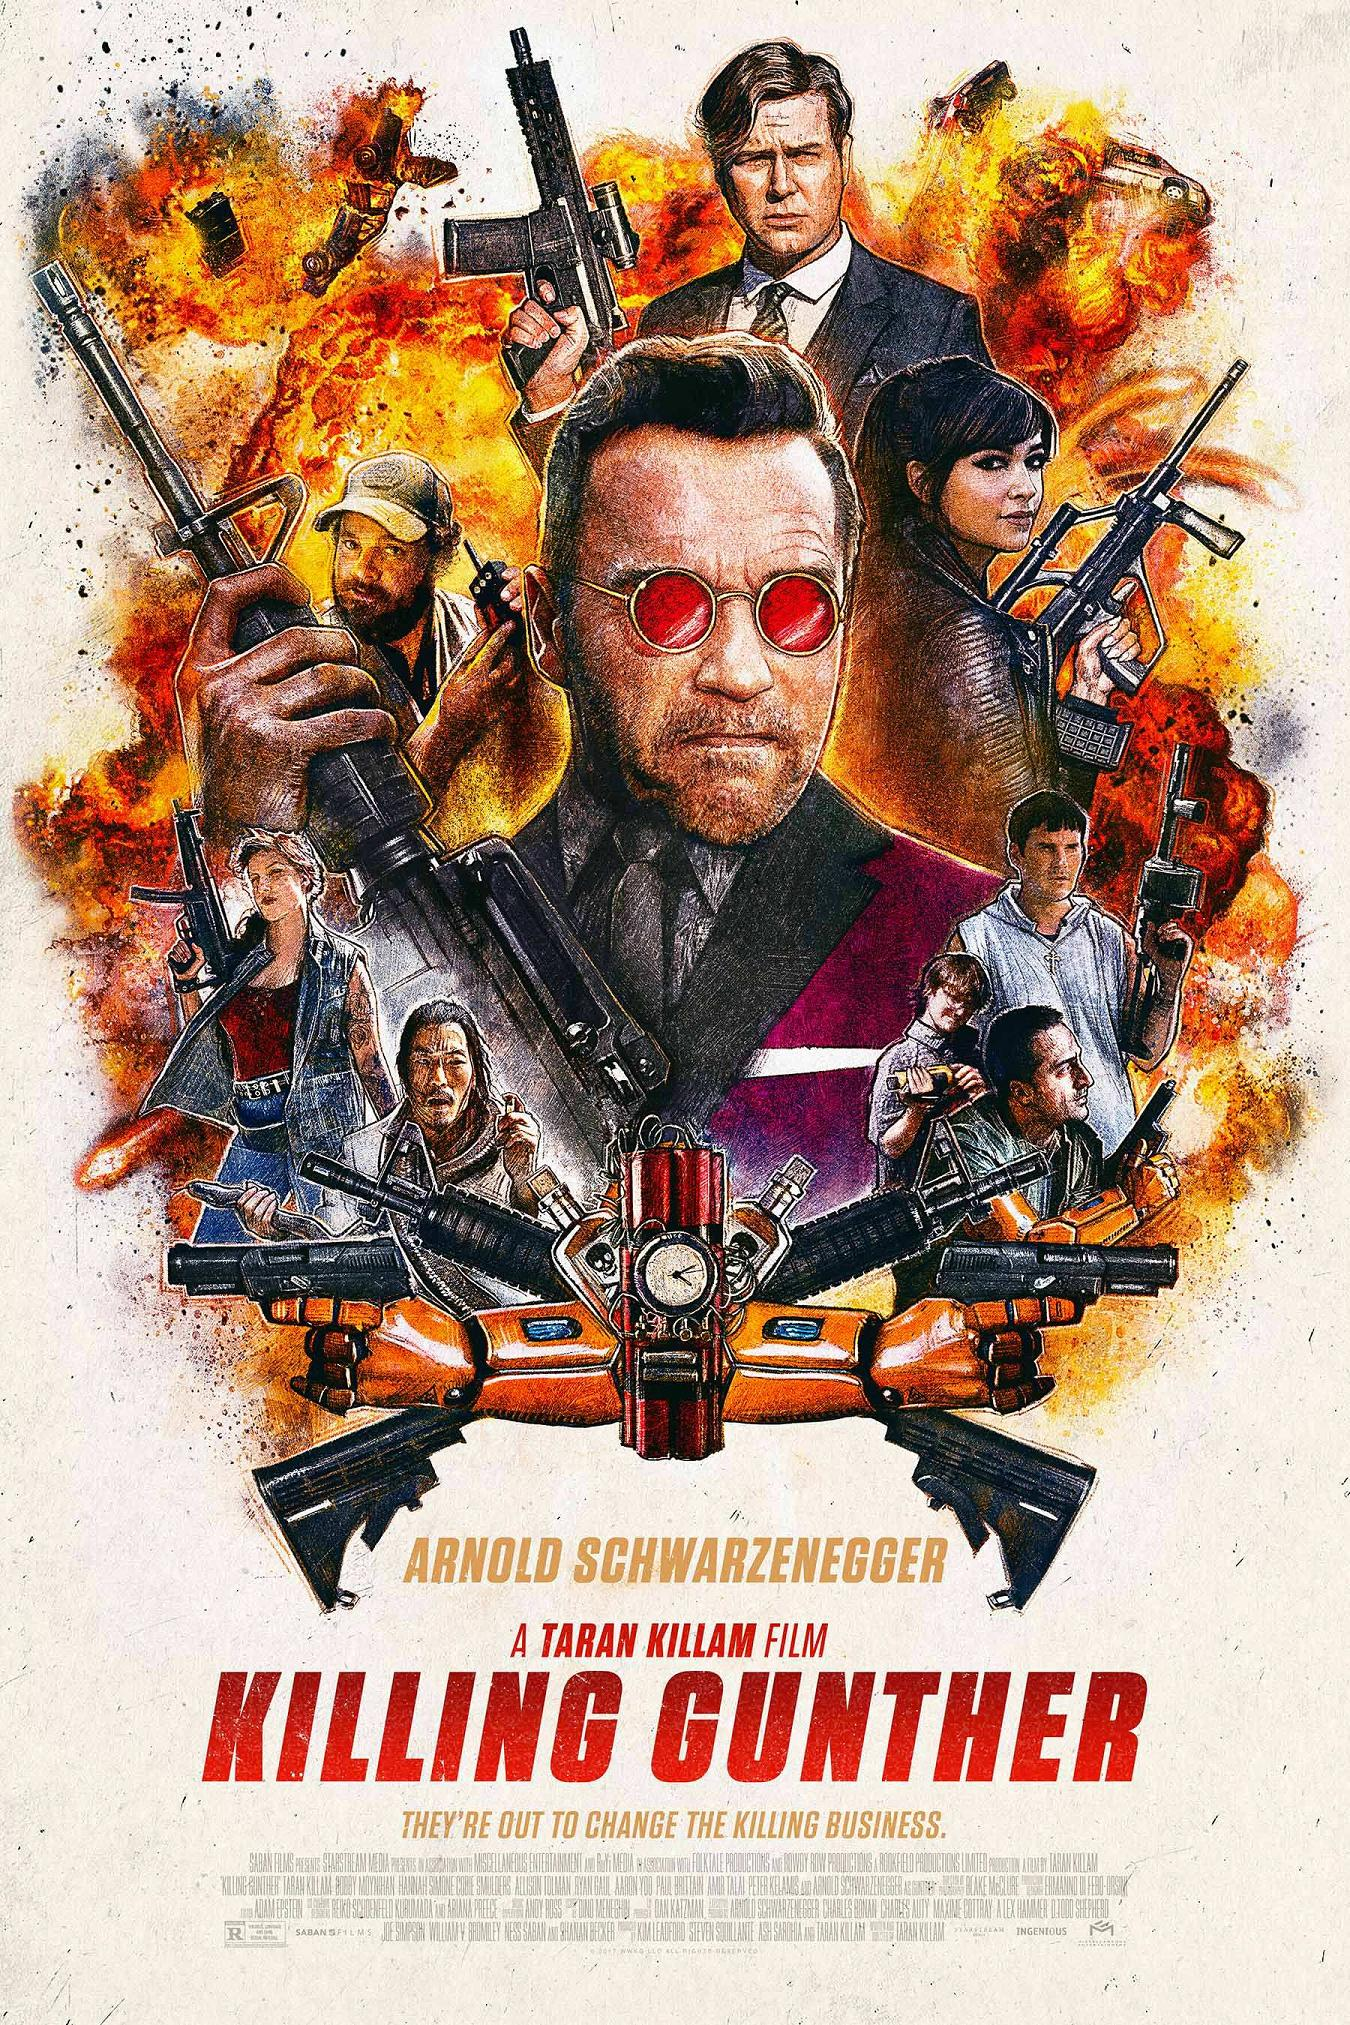 Killing Gunther Trailer & Poster